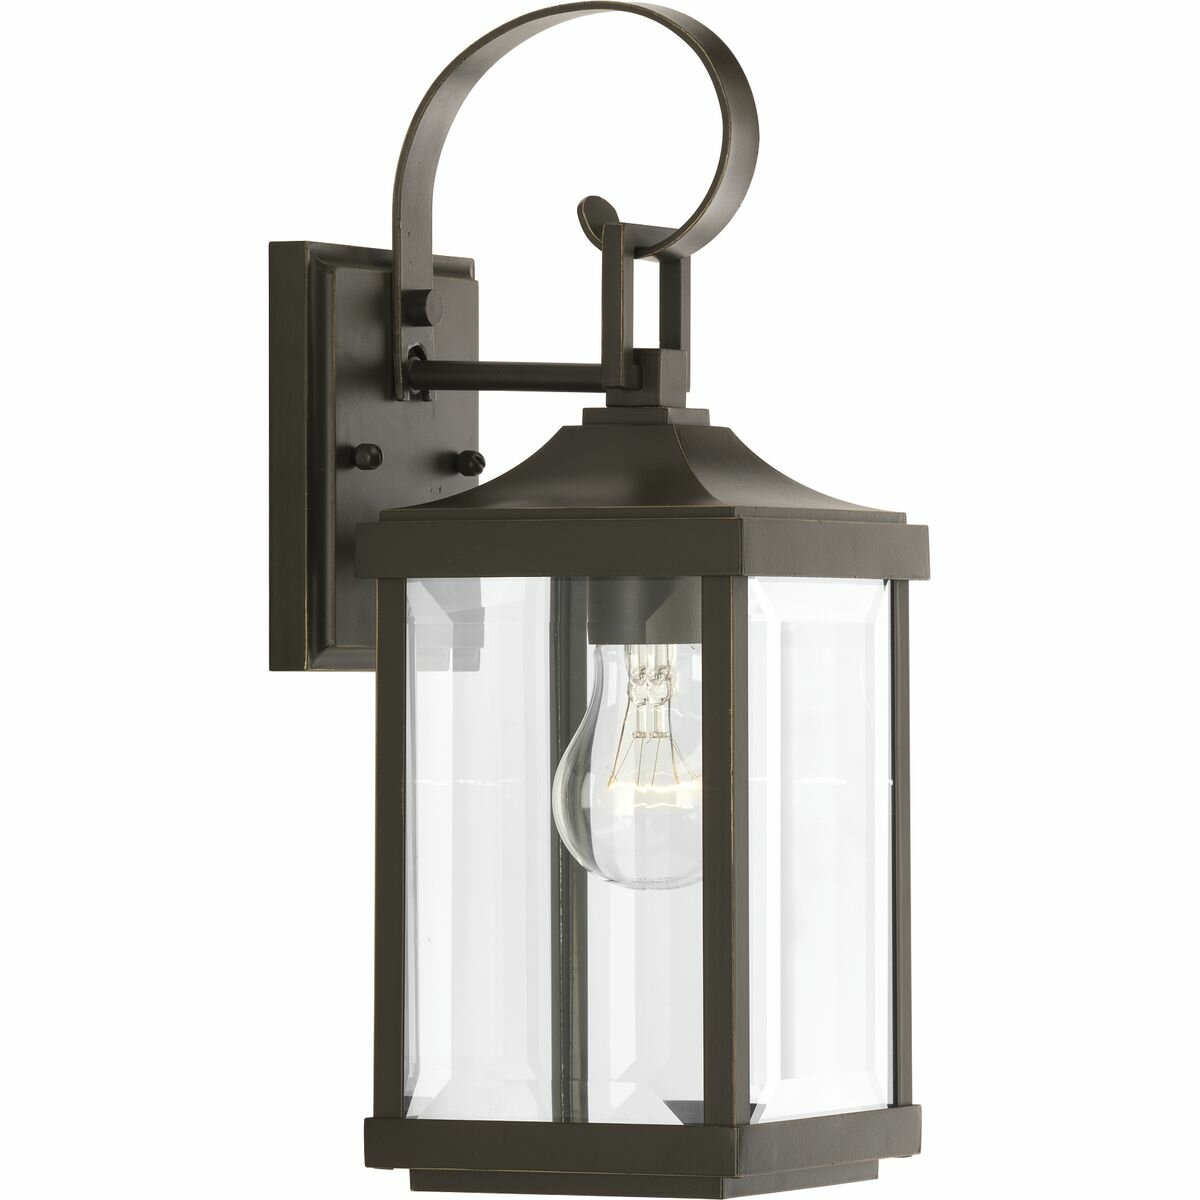 Birch Lane Agastya 1 Bulb 15 13 H Outdoor Wall Lantern Reviews Wayfair